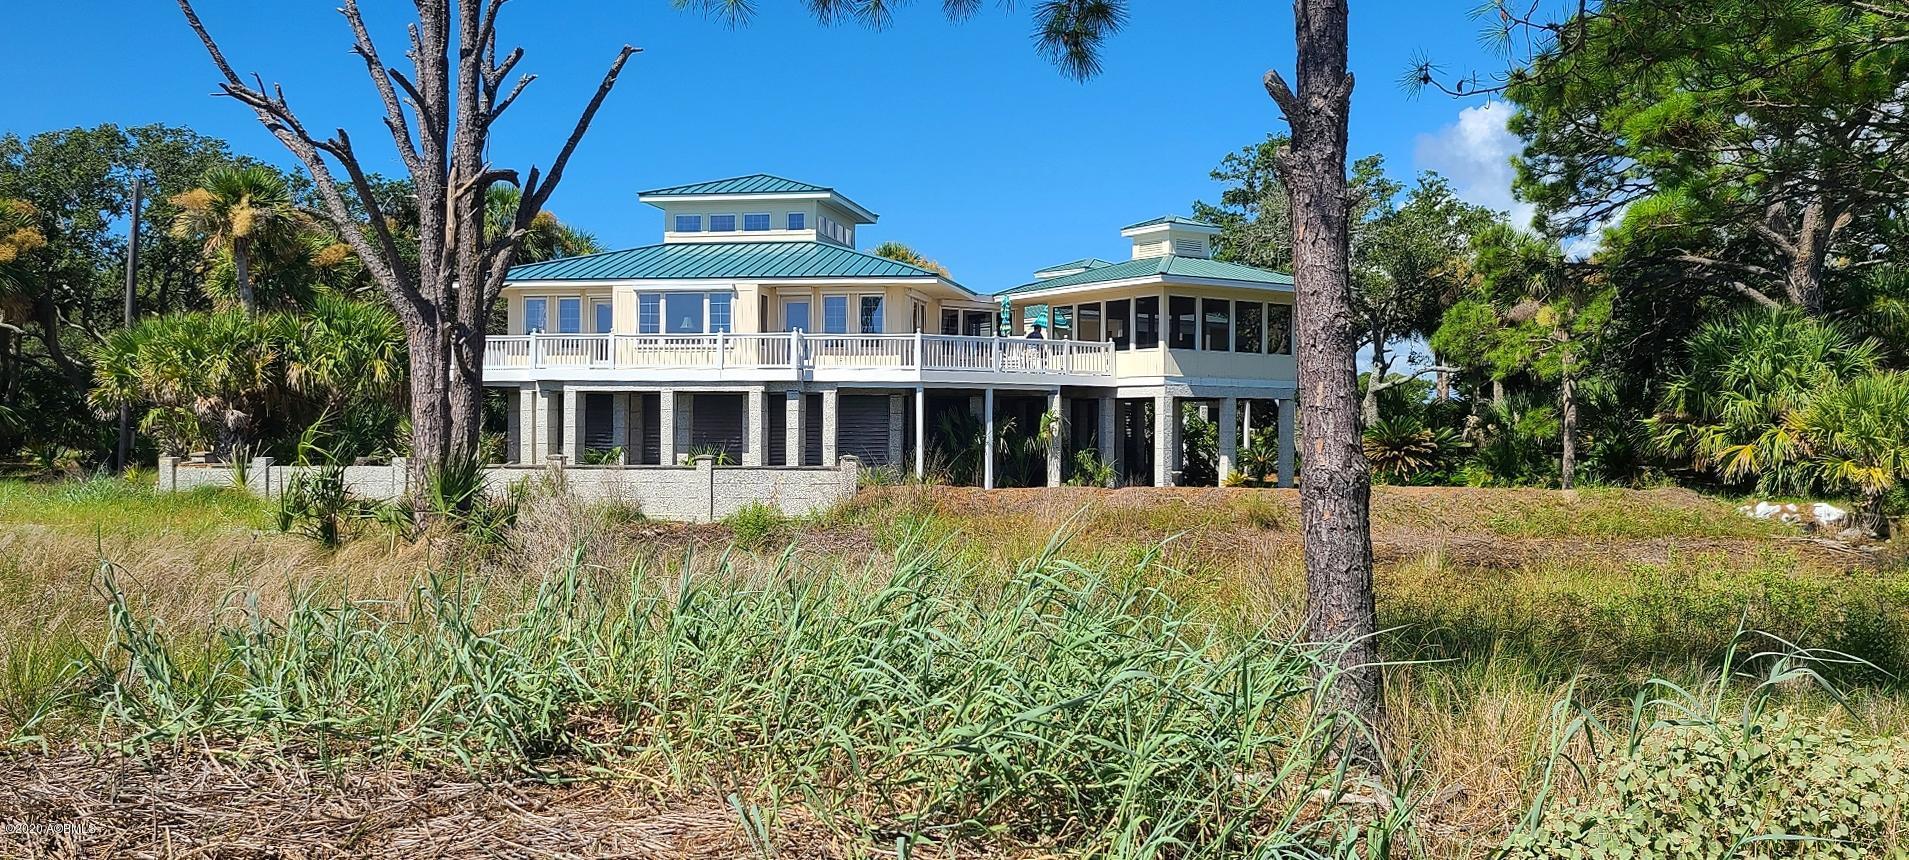 Photo of 18 River Club Drive, Fripp Island, SC 29920